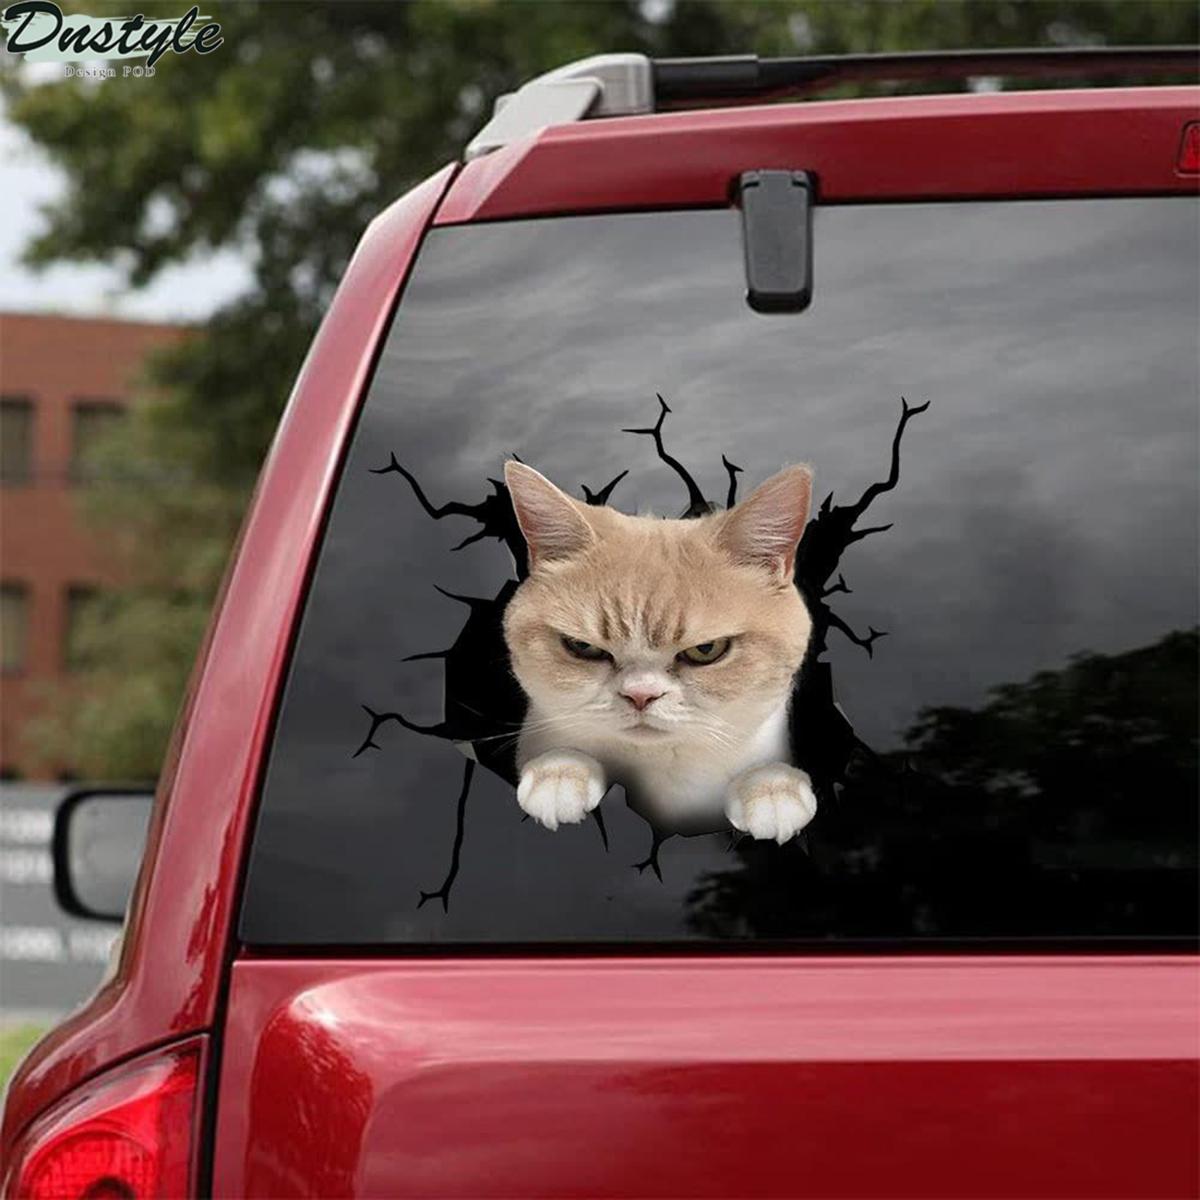 Grumpy cat car decal sticker 2